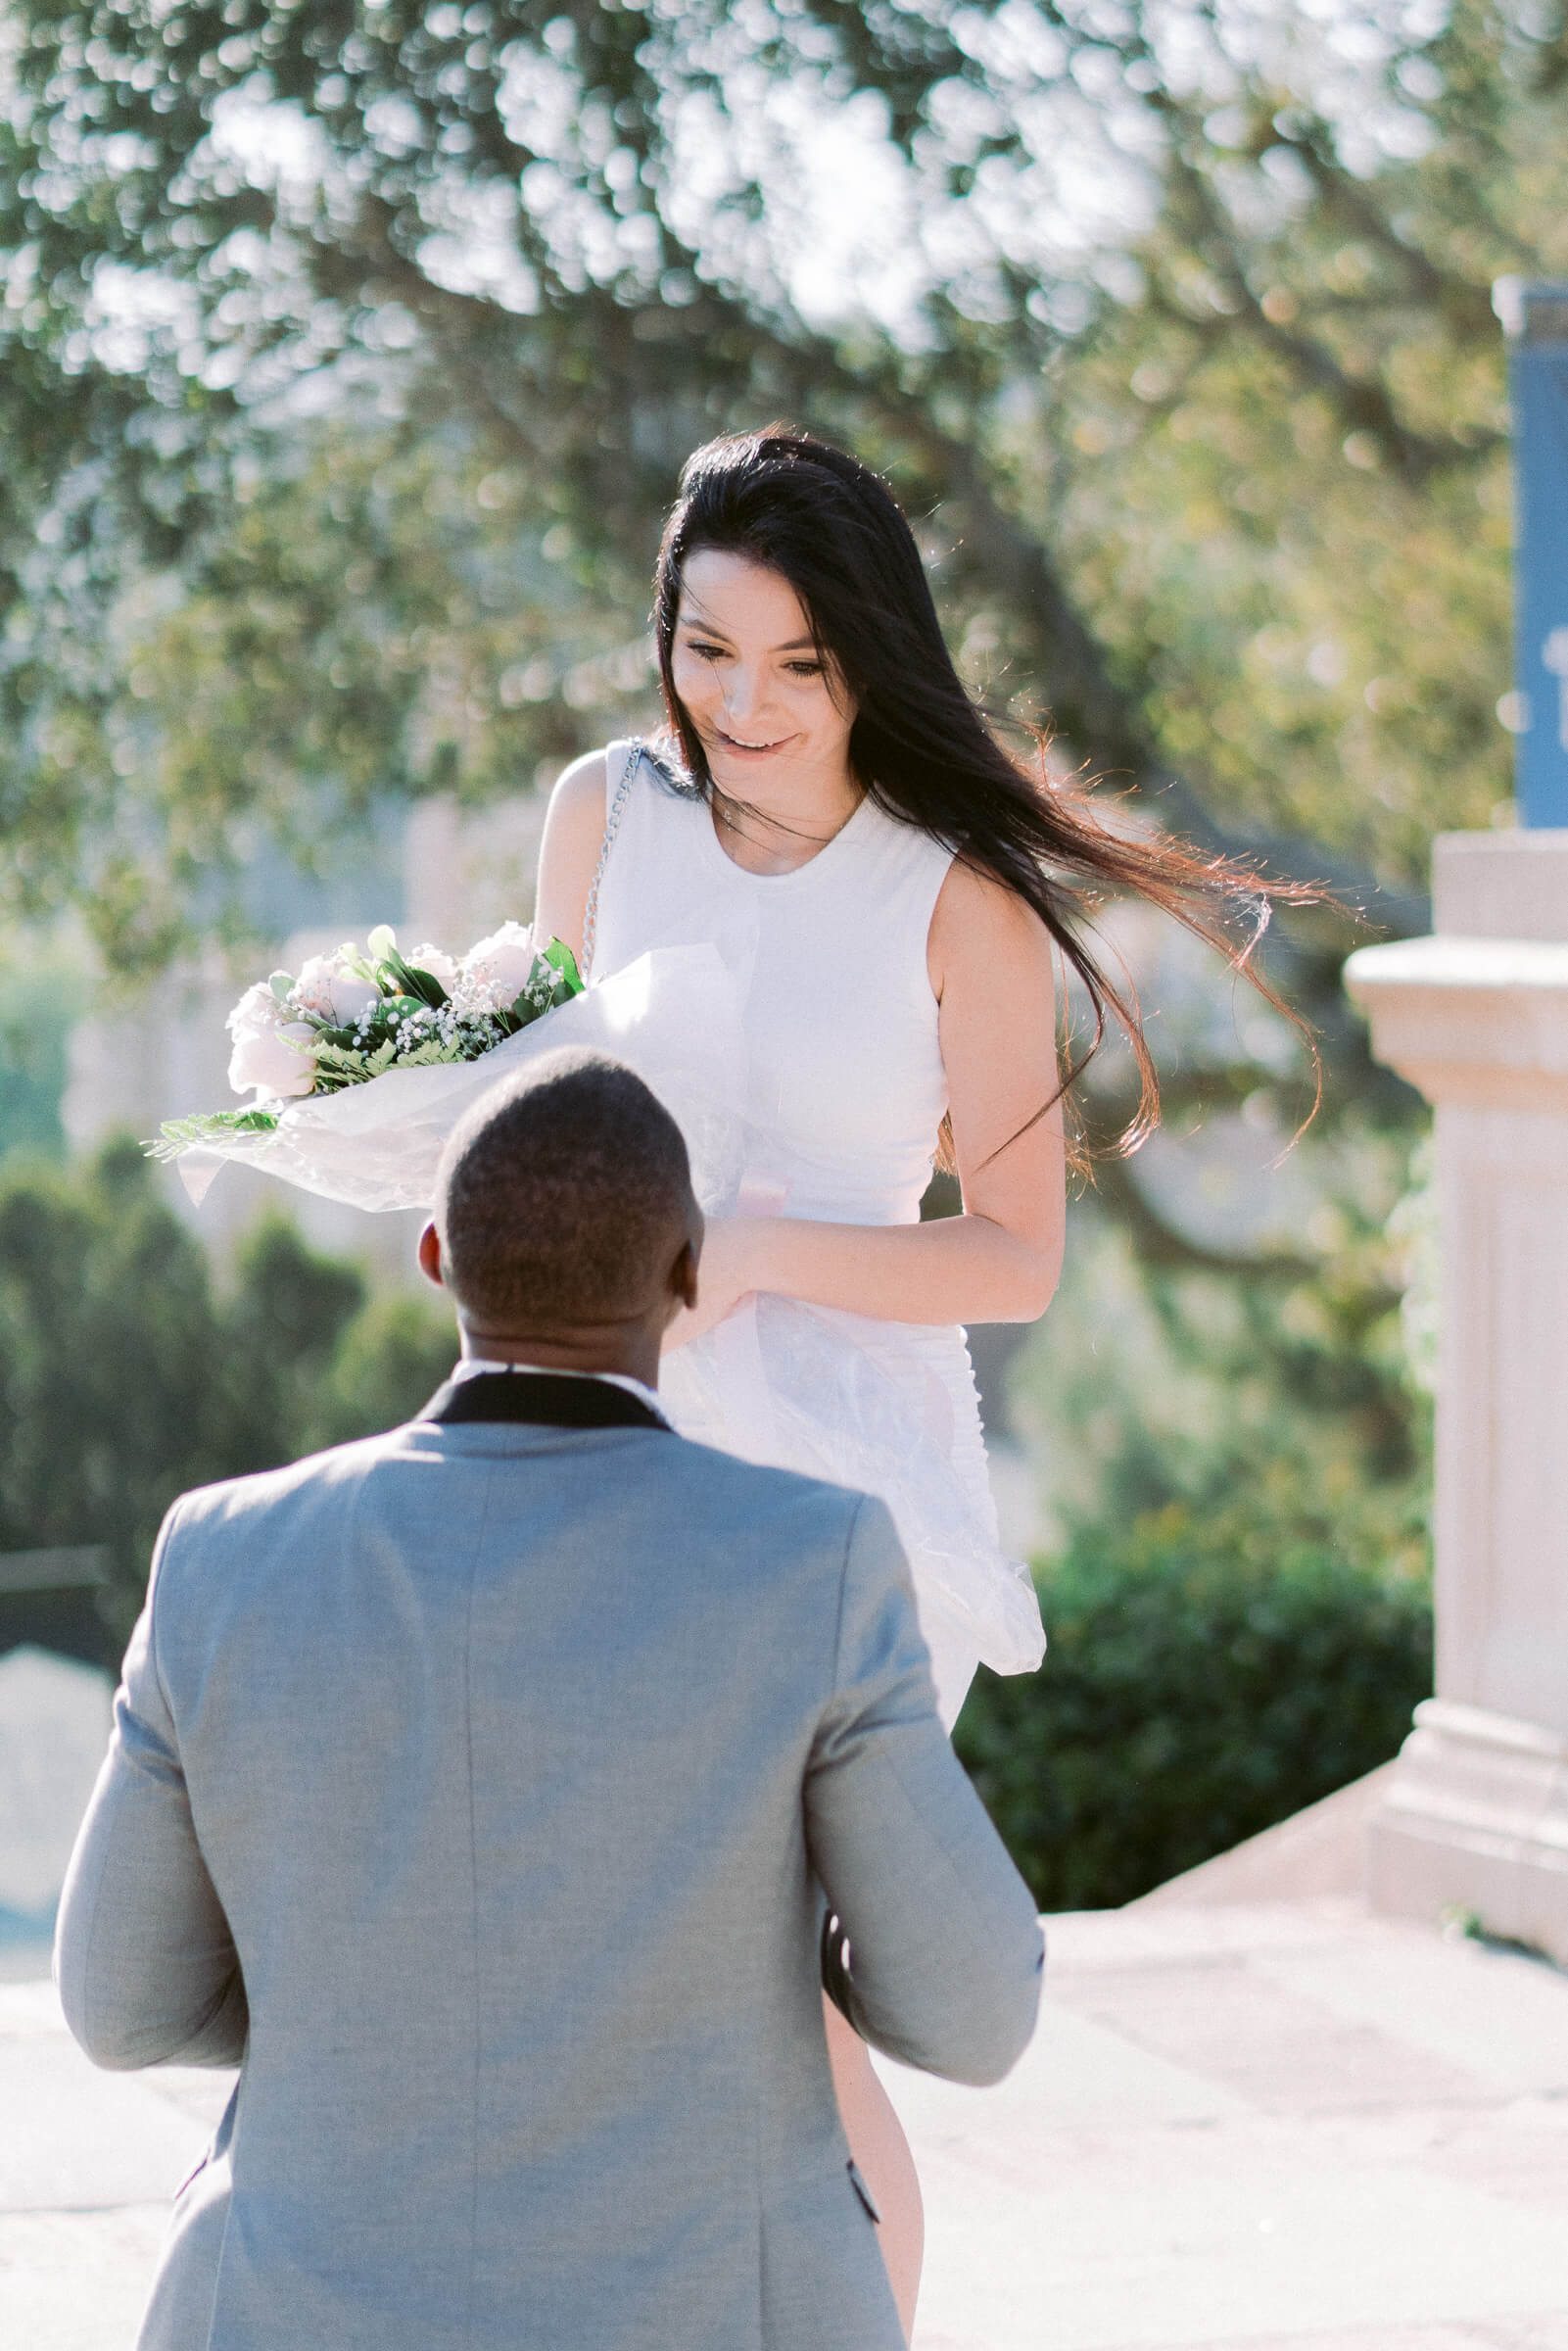 ucla-los-angeles-proposal-photographer-6.jpg